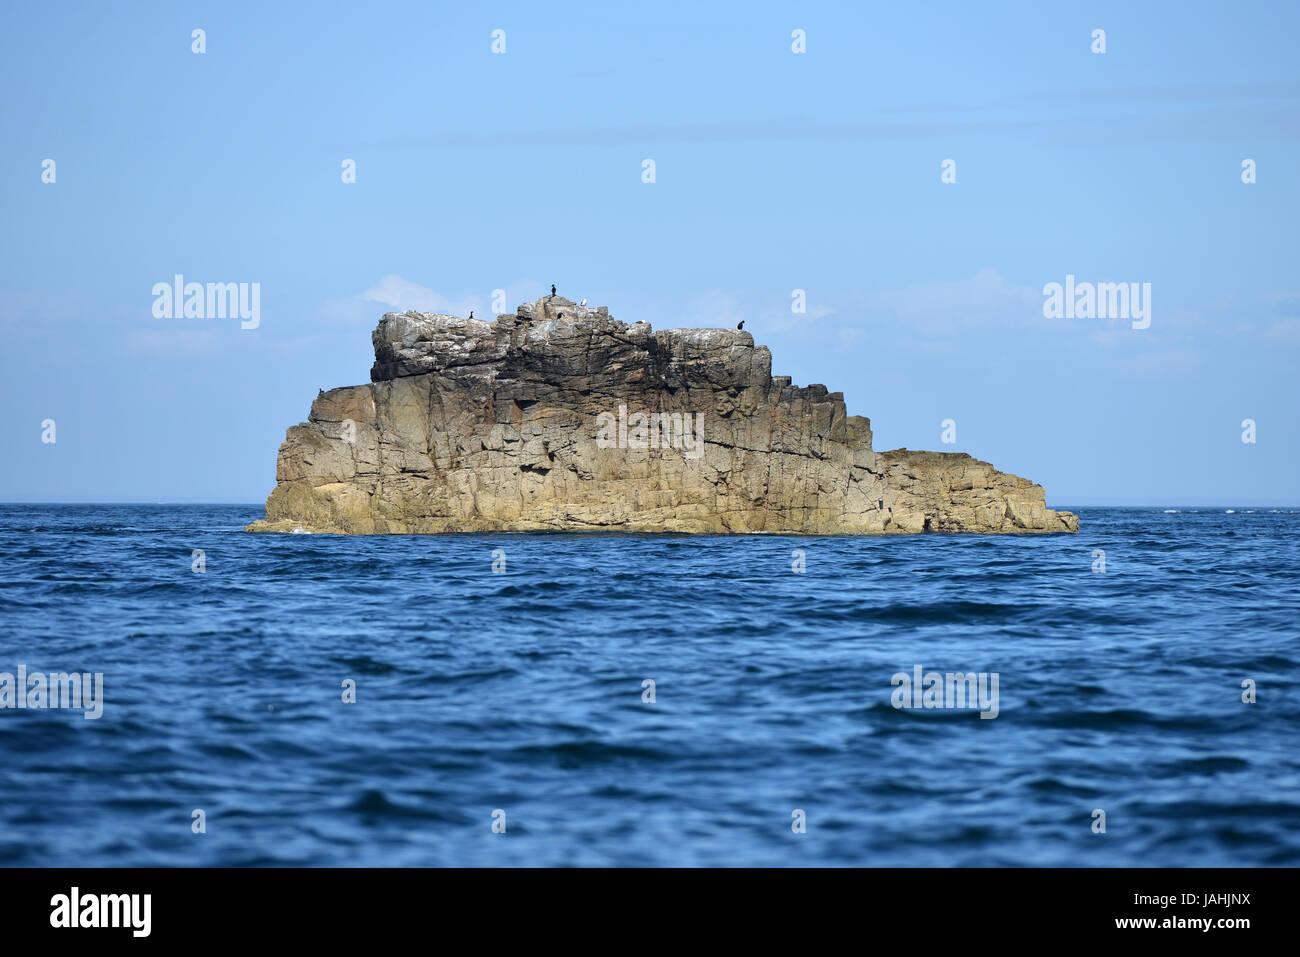 Sea rock with seabirds, Sark, Guernsey. - Stock Image